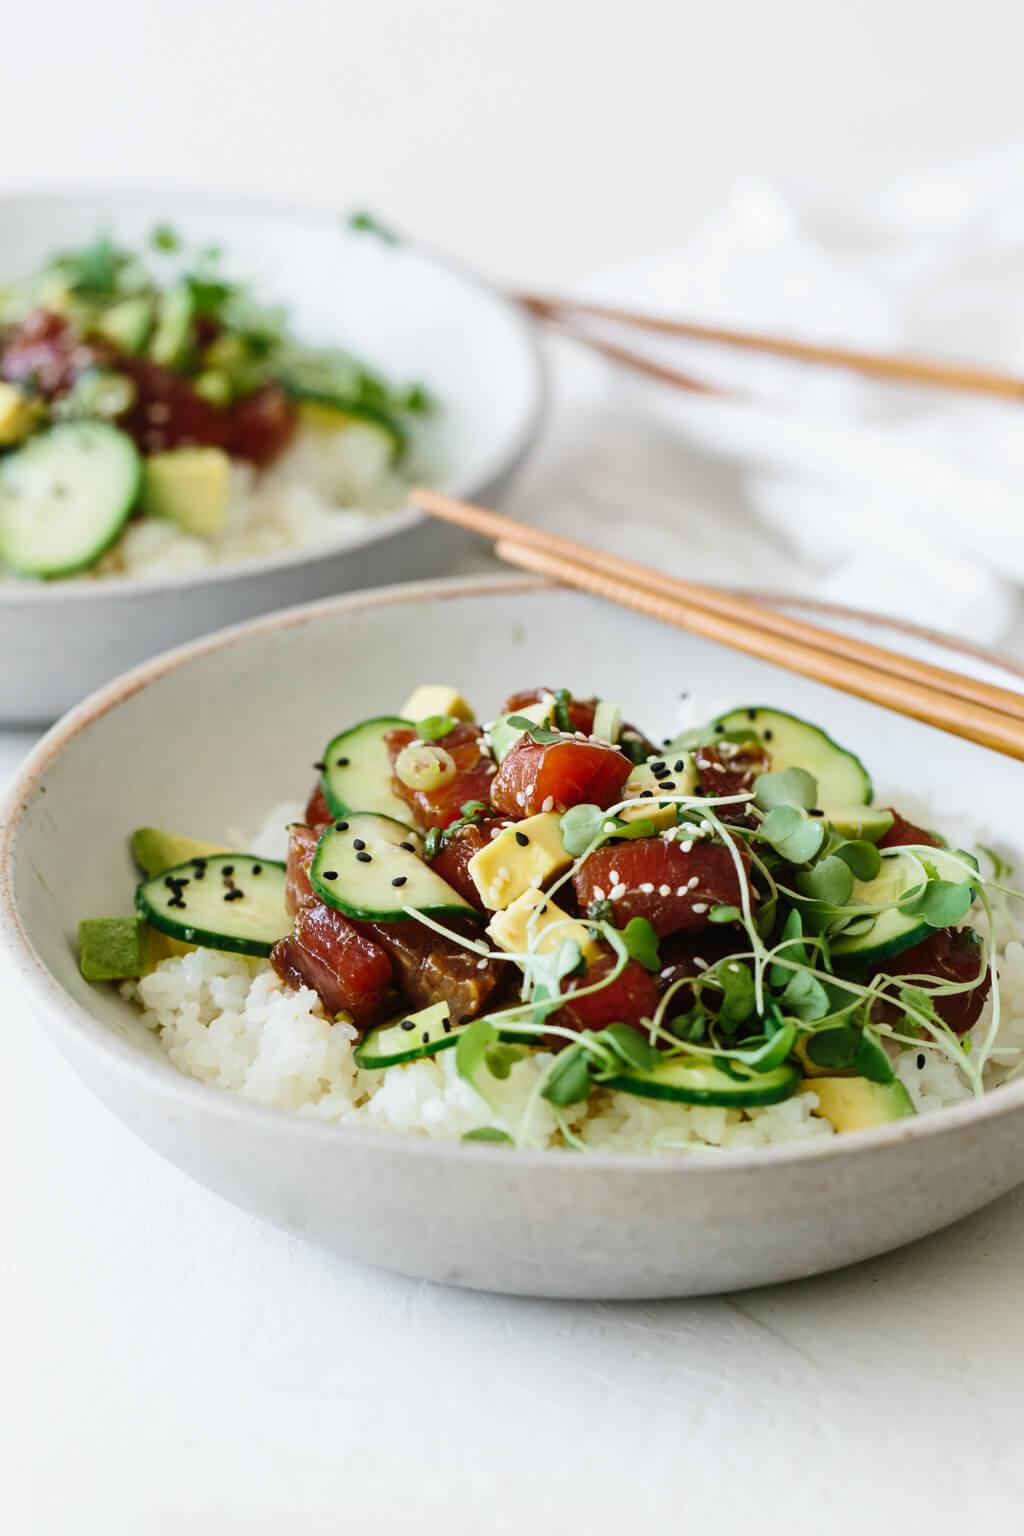 Ahi tuna poke bowl with chopsticks.